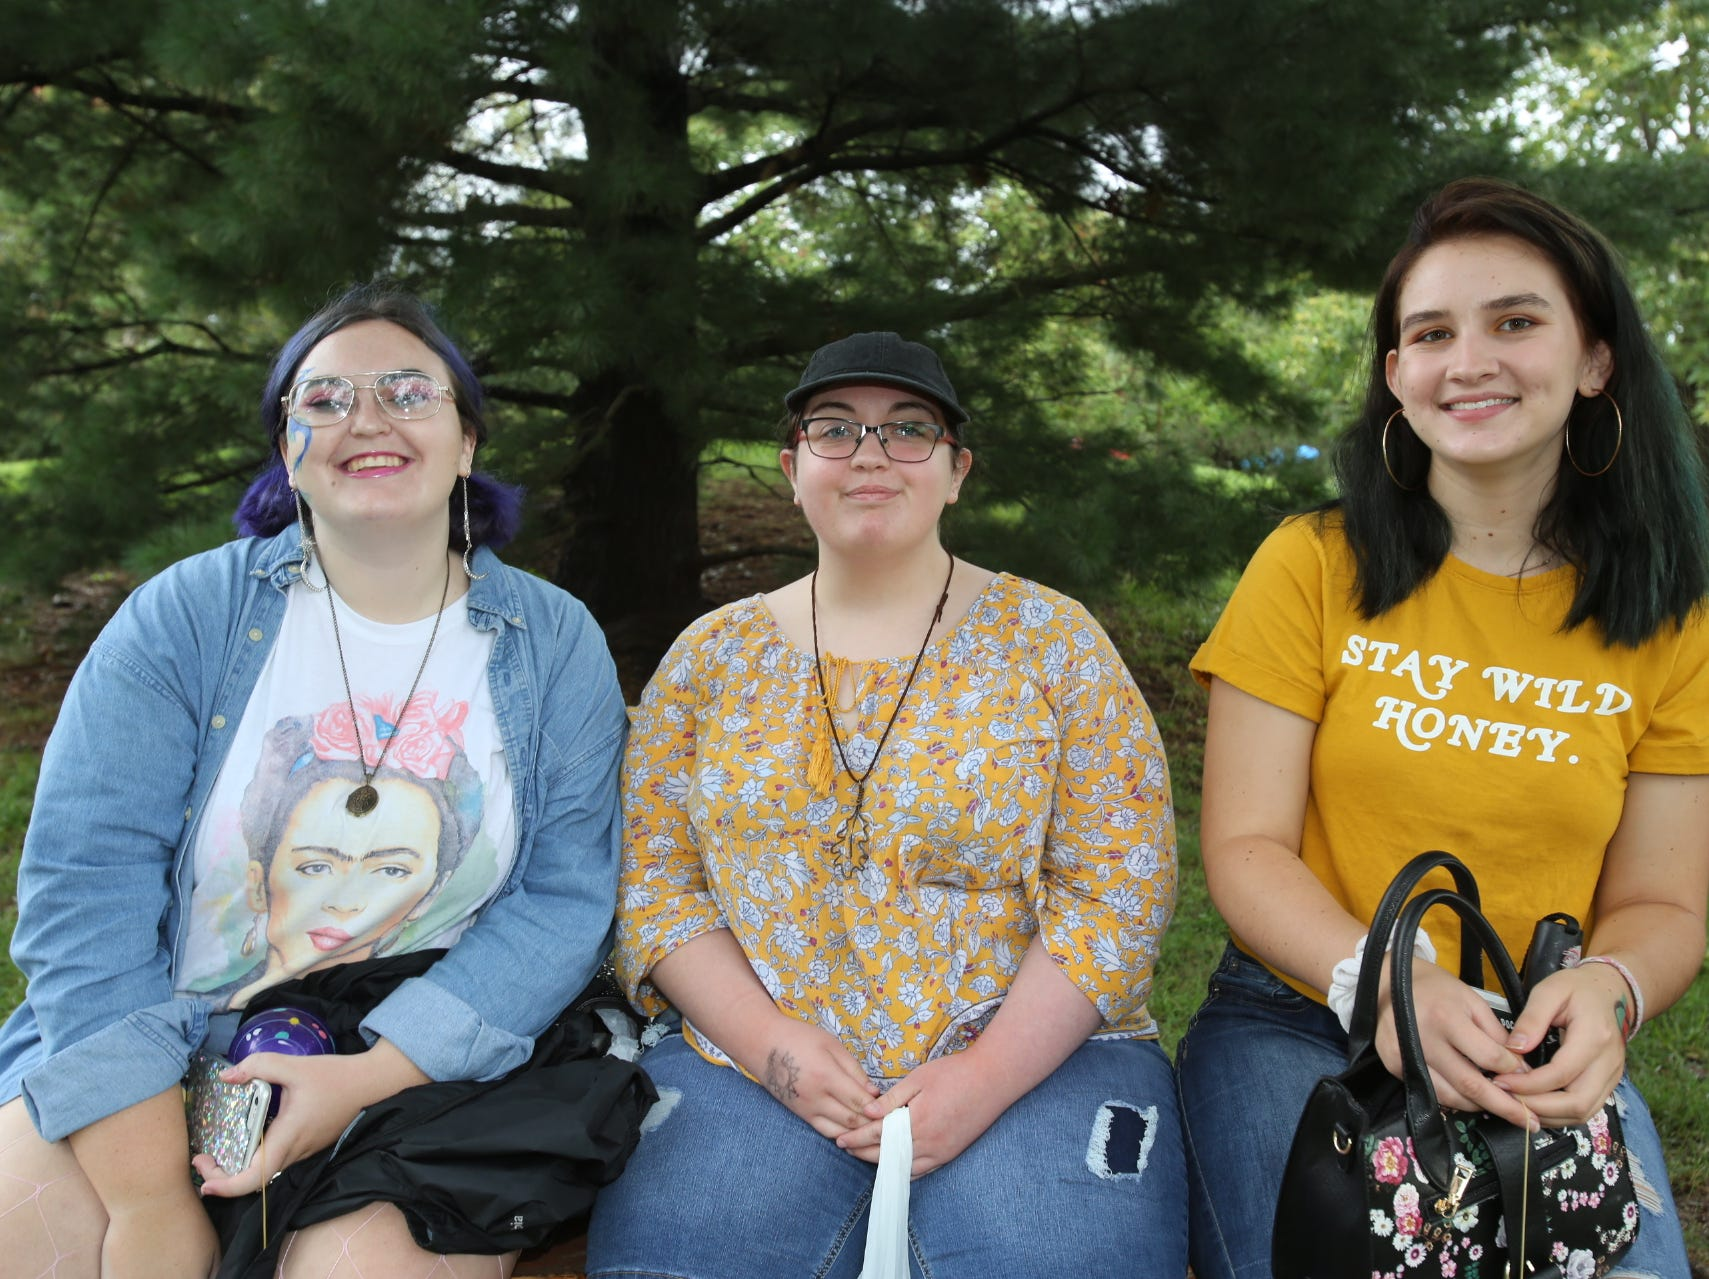 Katie Groves, Anna Kleier, and Heather Georges